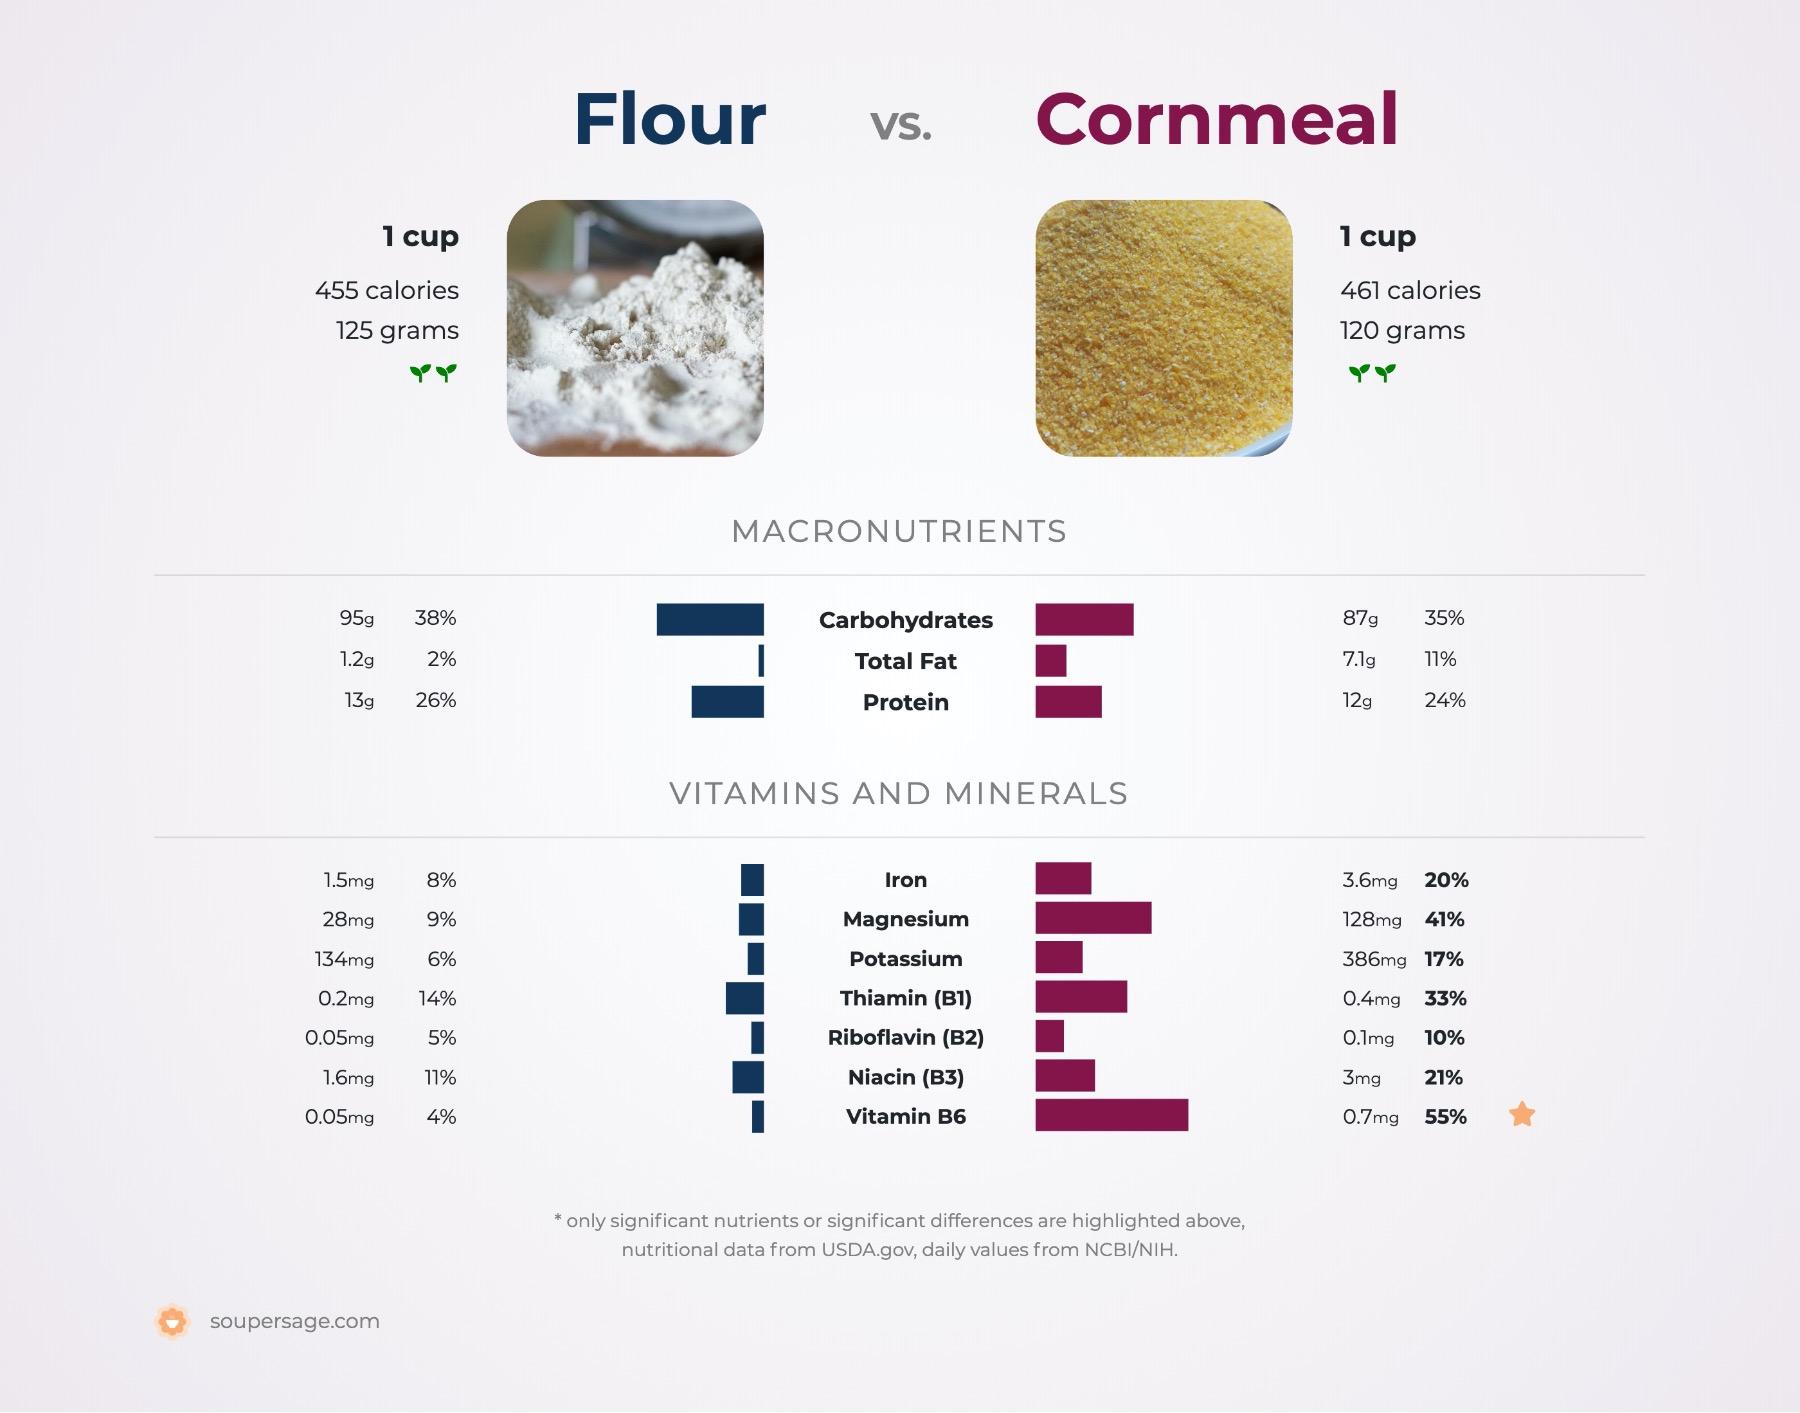 nutrition comparison of cornmeal vs. flour